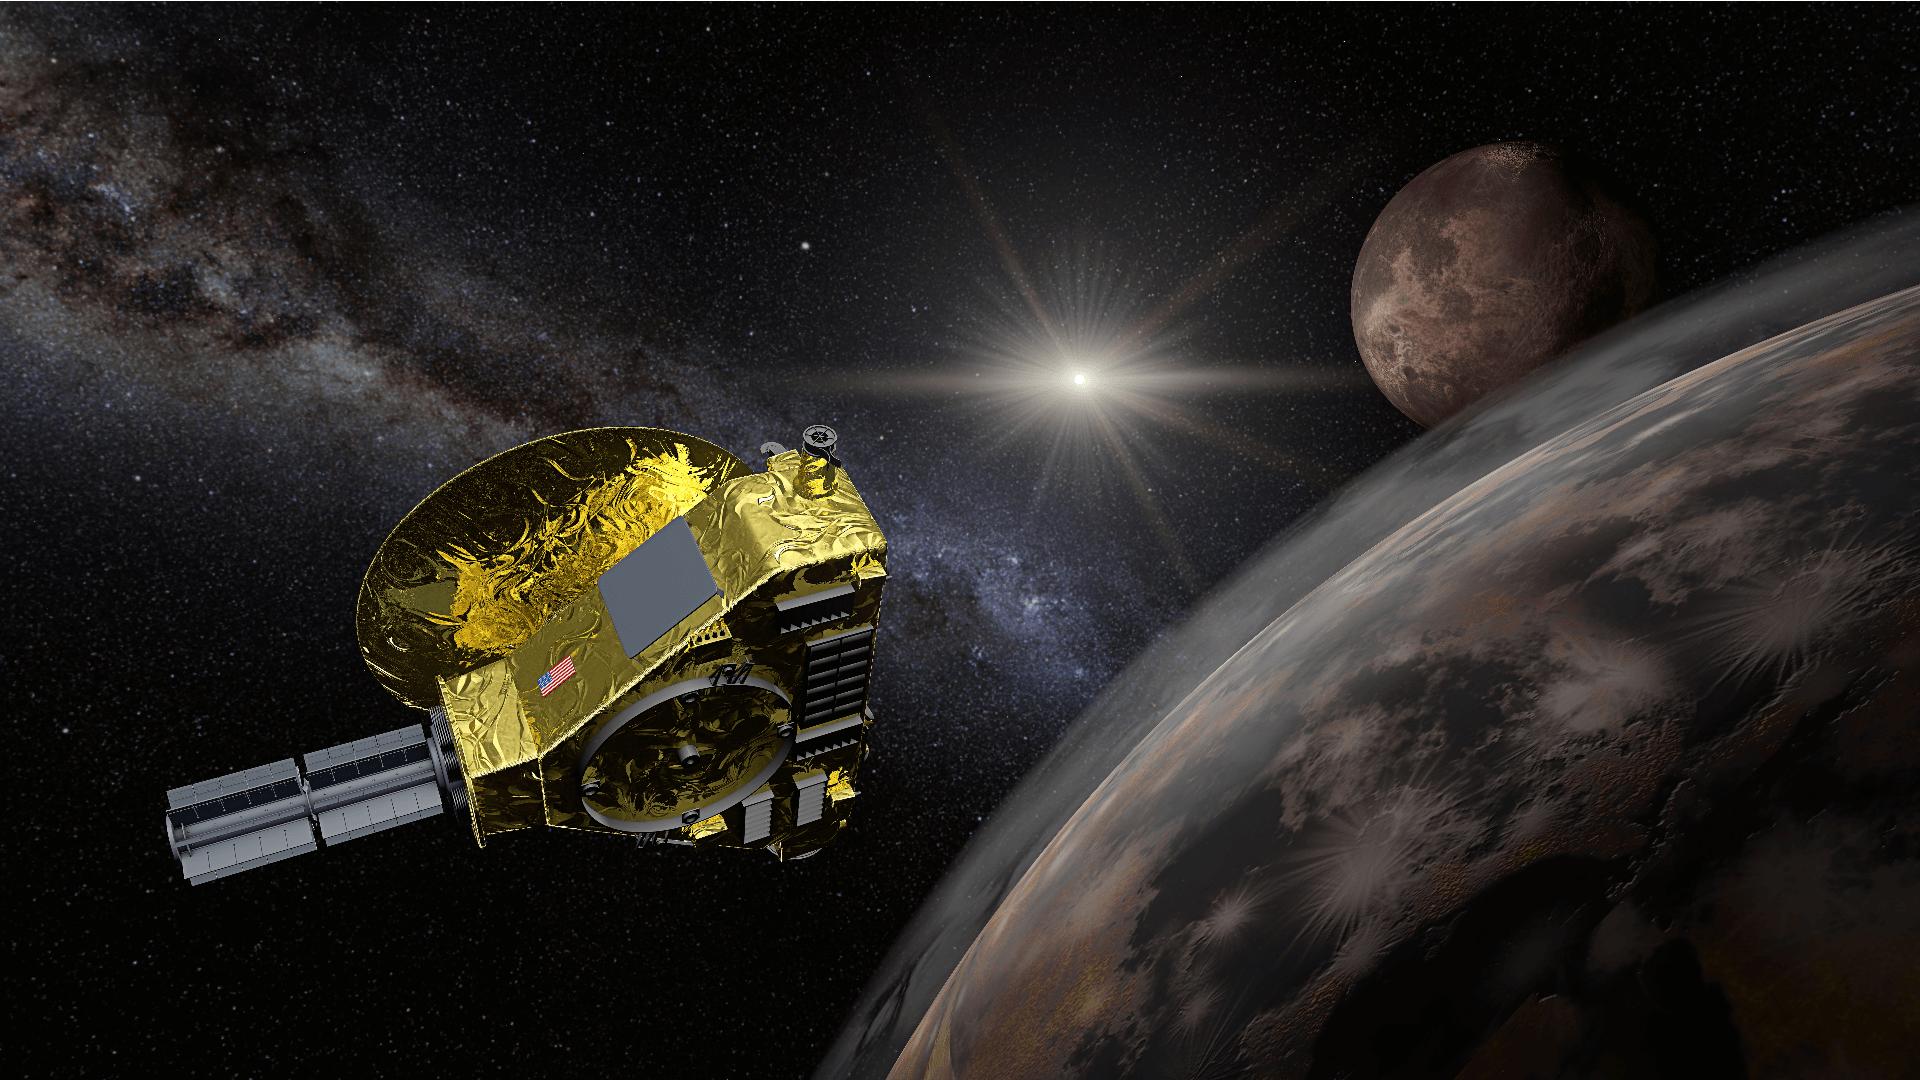 Die NASA Raumsonde New Horizons sieht Sterne ganz anders als wir